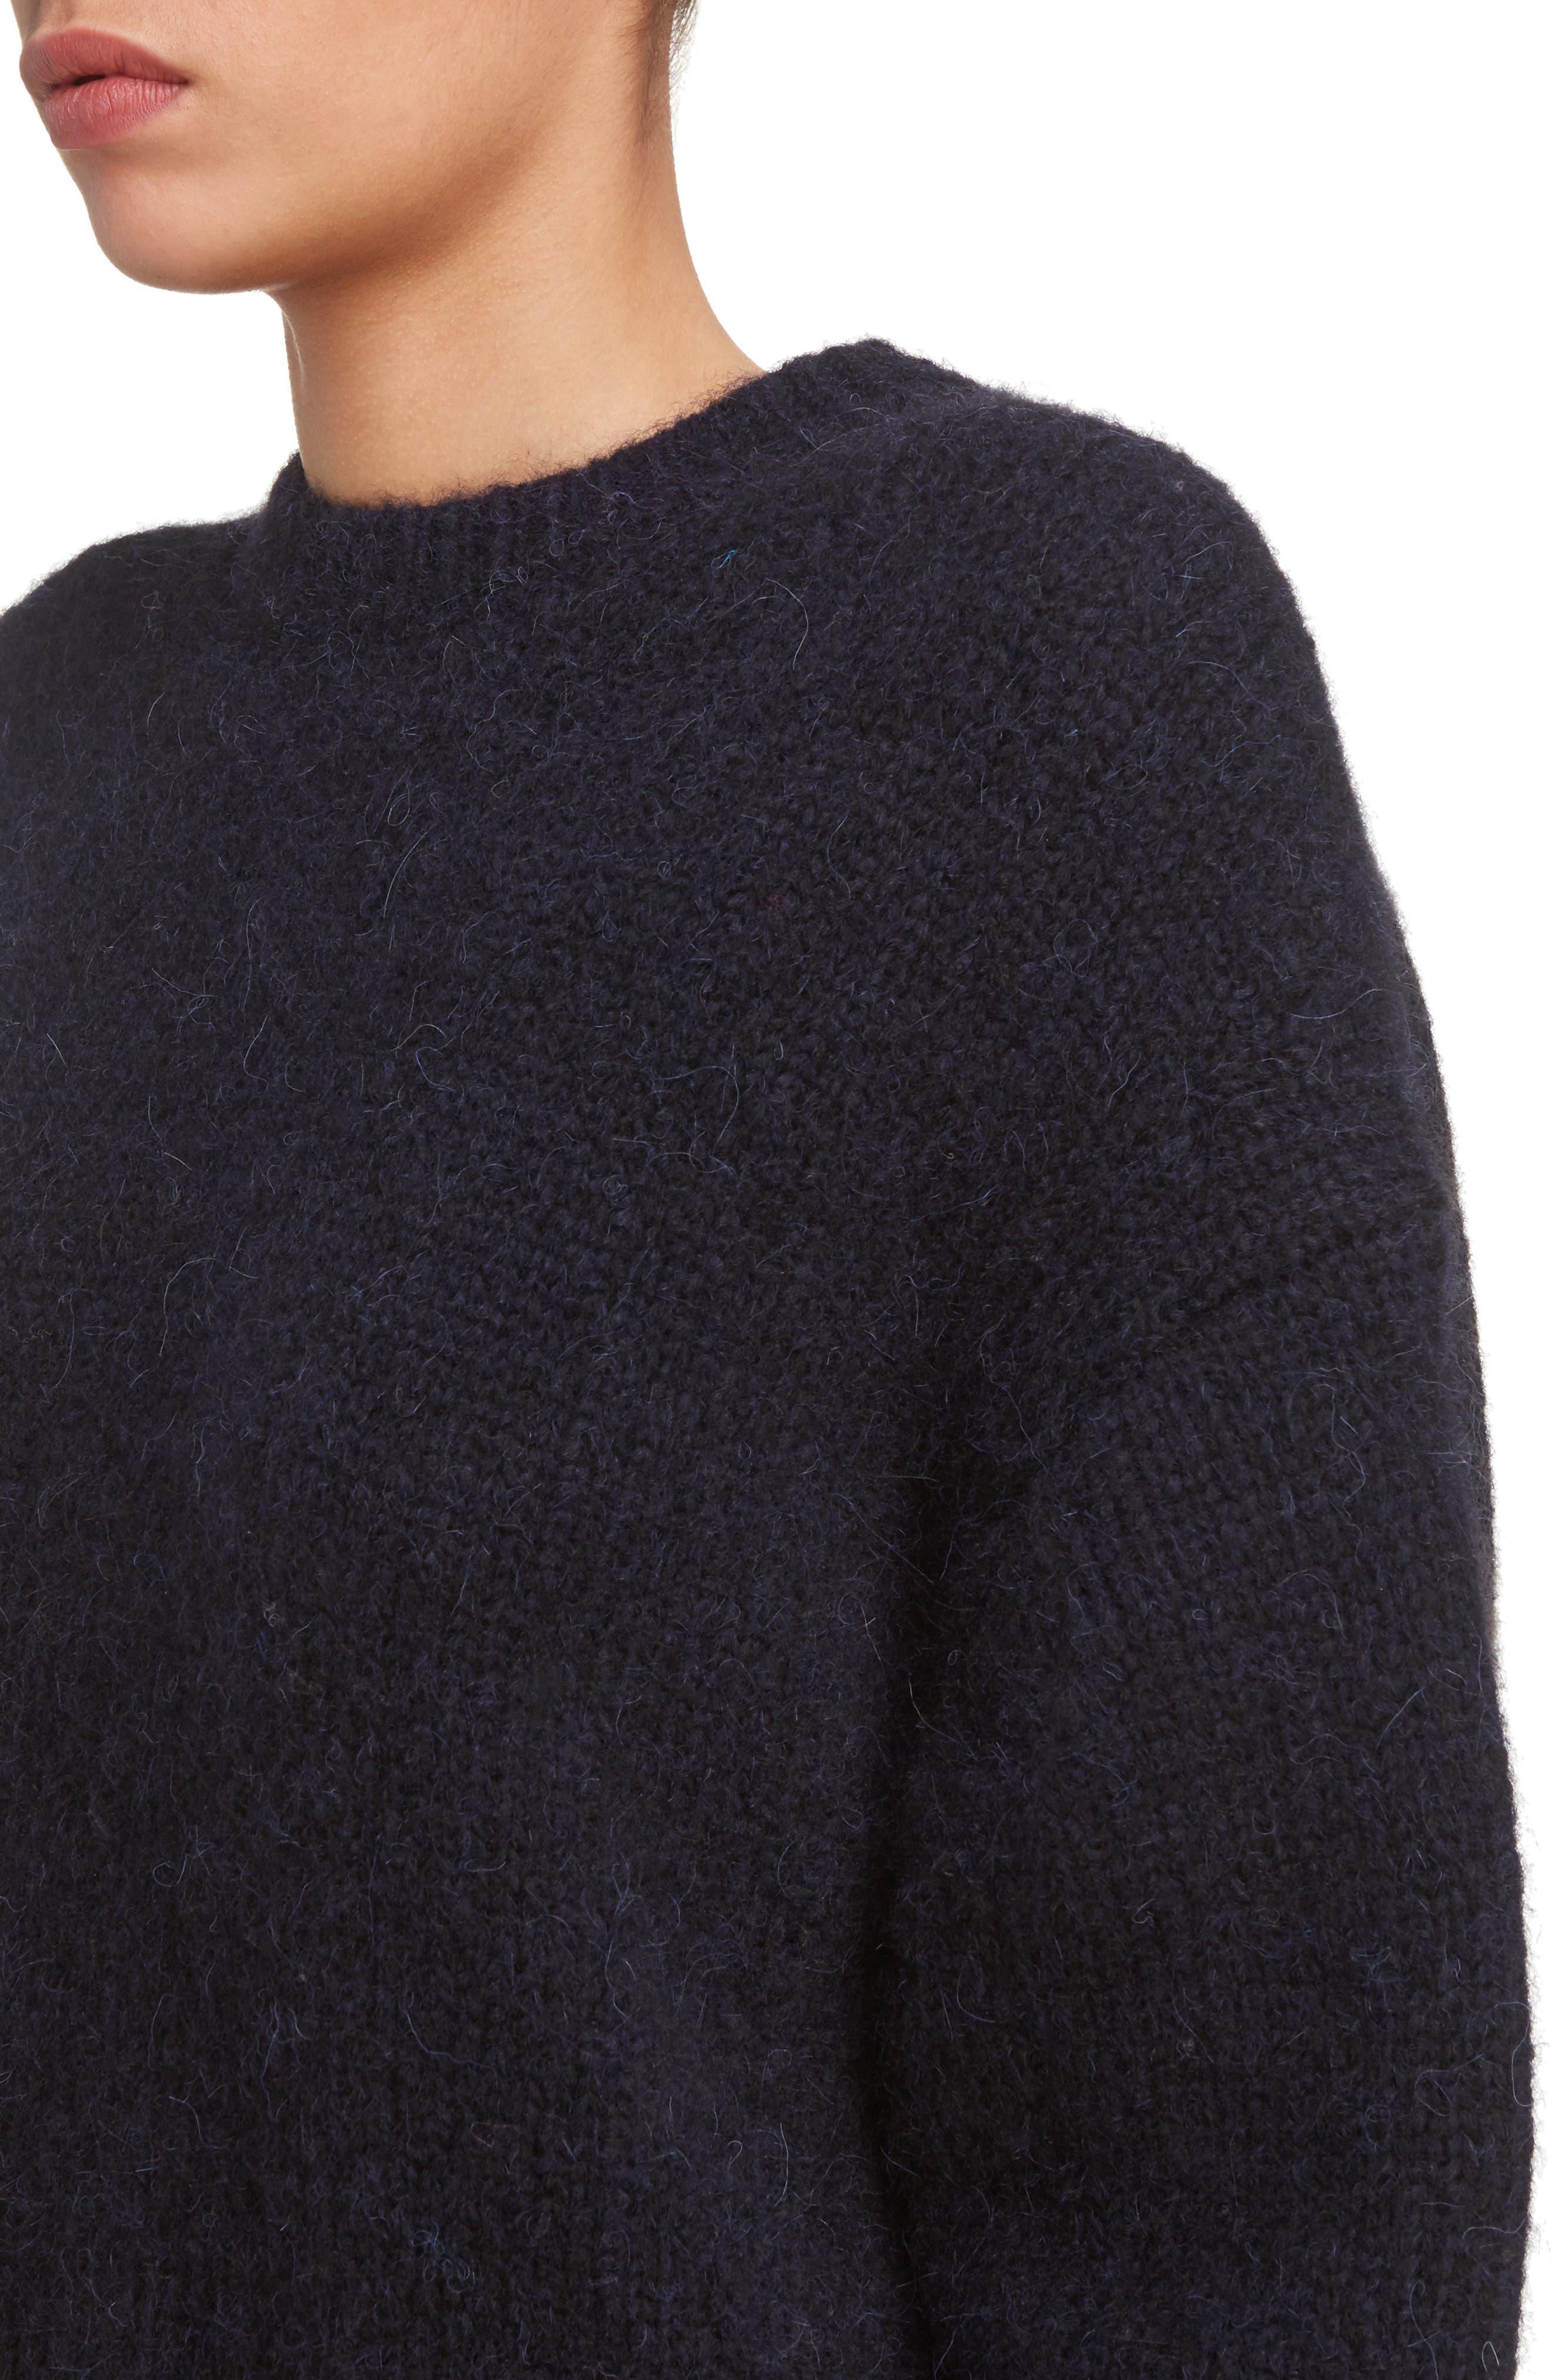 Karel Oversize Merino Sweater,                             Alternate thumbnail 4, color,                             Black